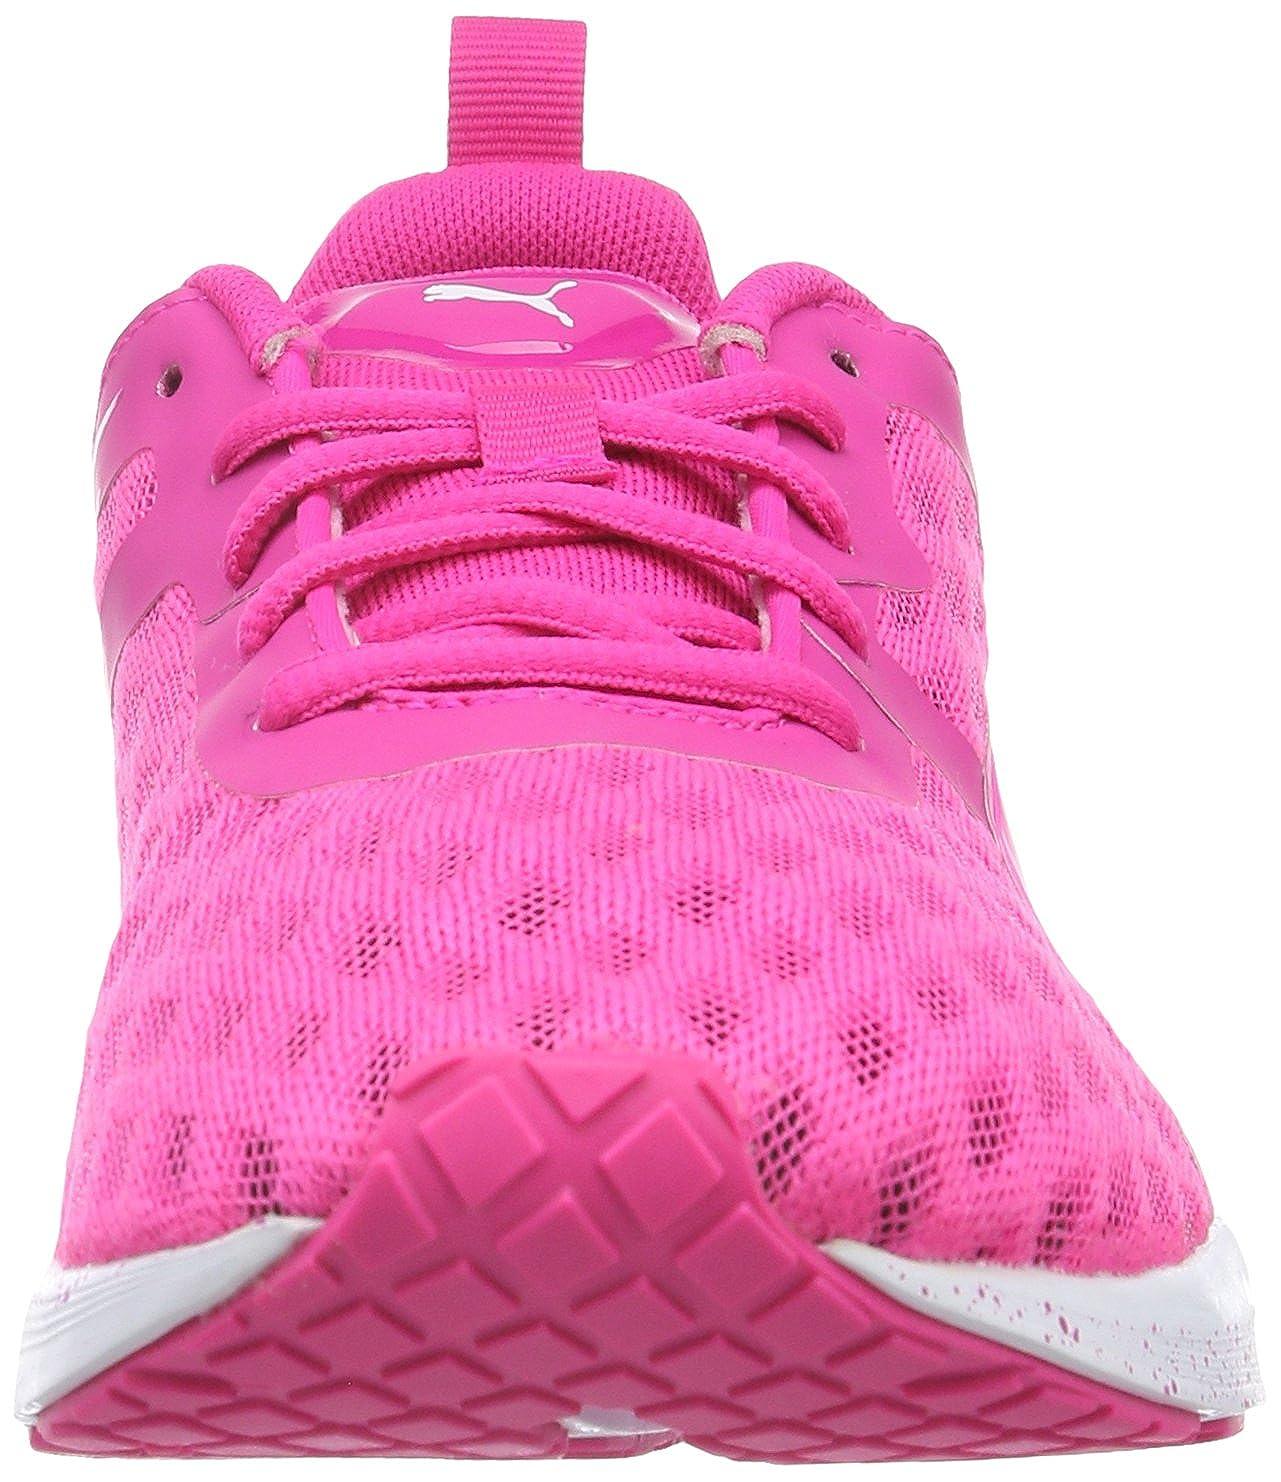 Puma Damen Pulse Xt V2 Ft WNS Hallenschuhe Weiß Pink (Pink Glo-puma Weiß Hallenschuhe 03) 76757e